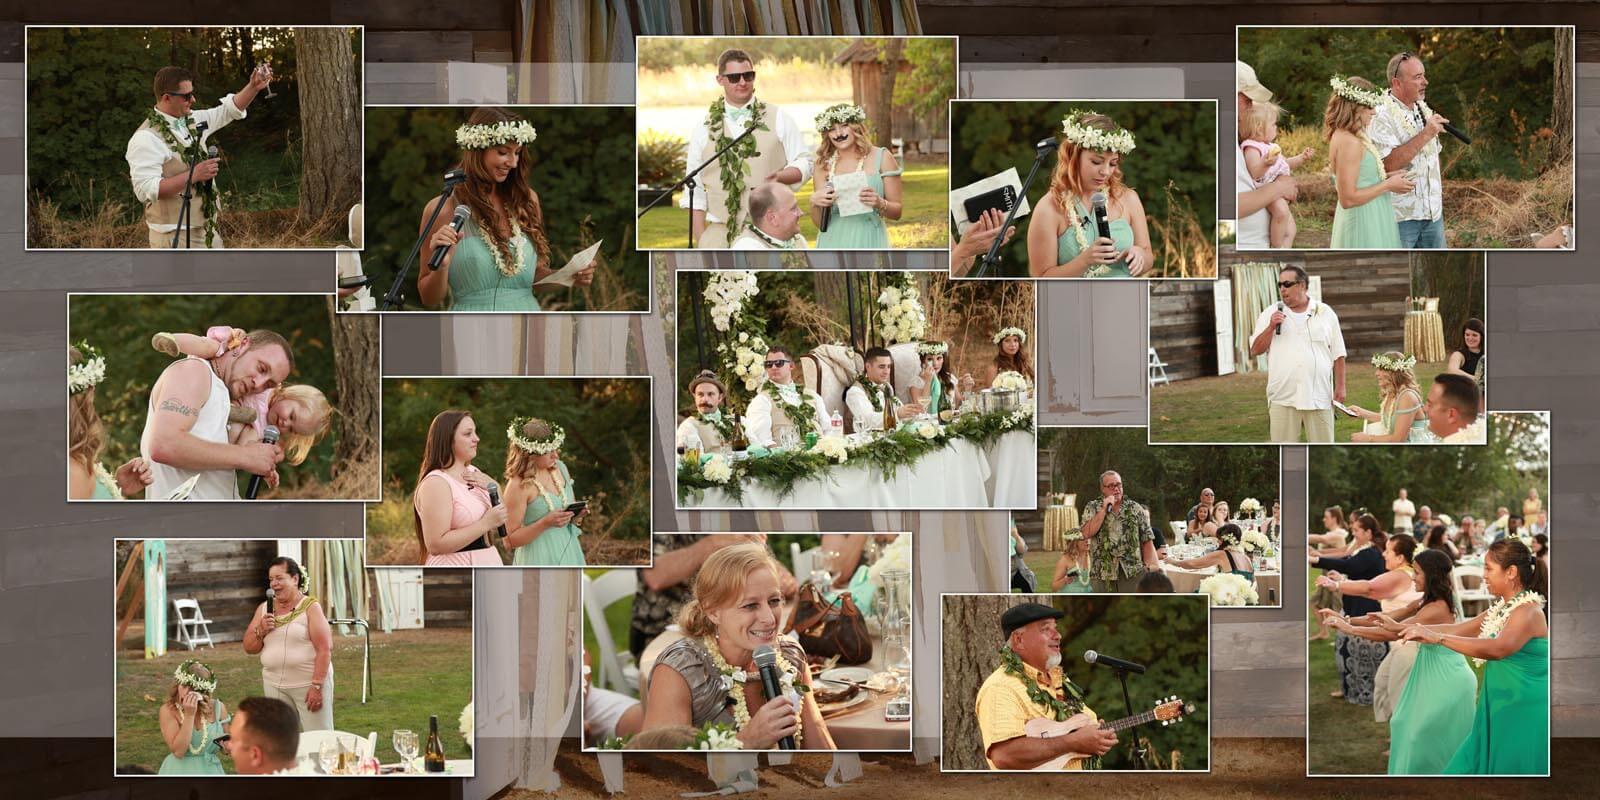 Jasper-House-Farm-Outdoor-Wedding-Lane-County-Oregon-photographers-052-053.jpg